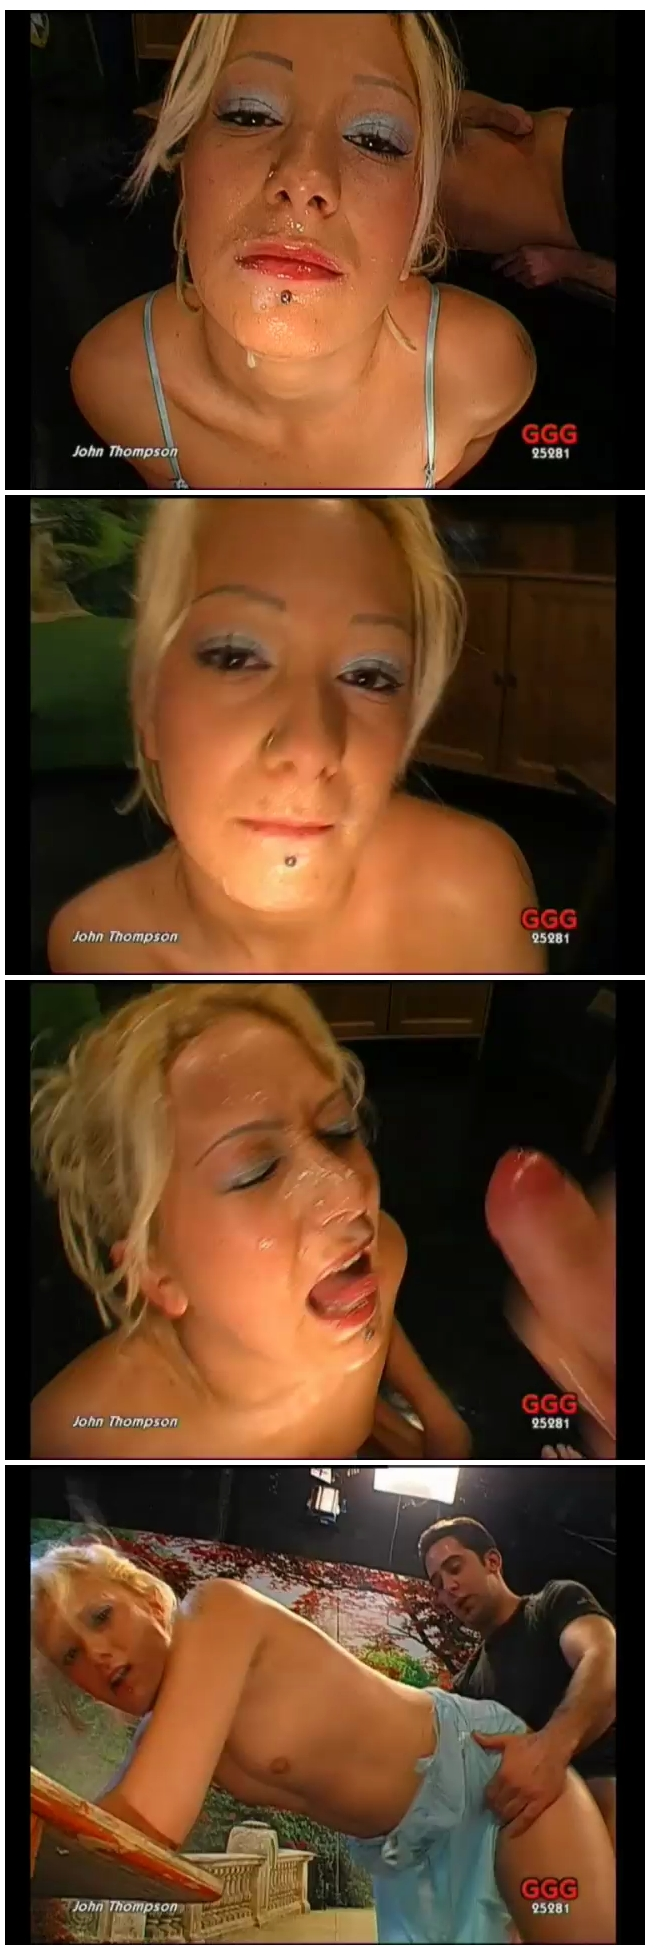 Young cum lover bibi - german goo girls